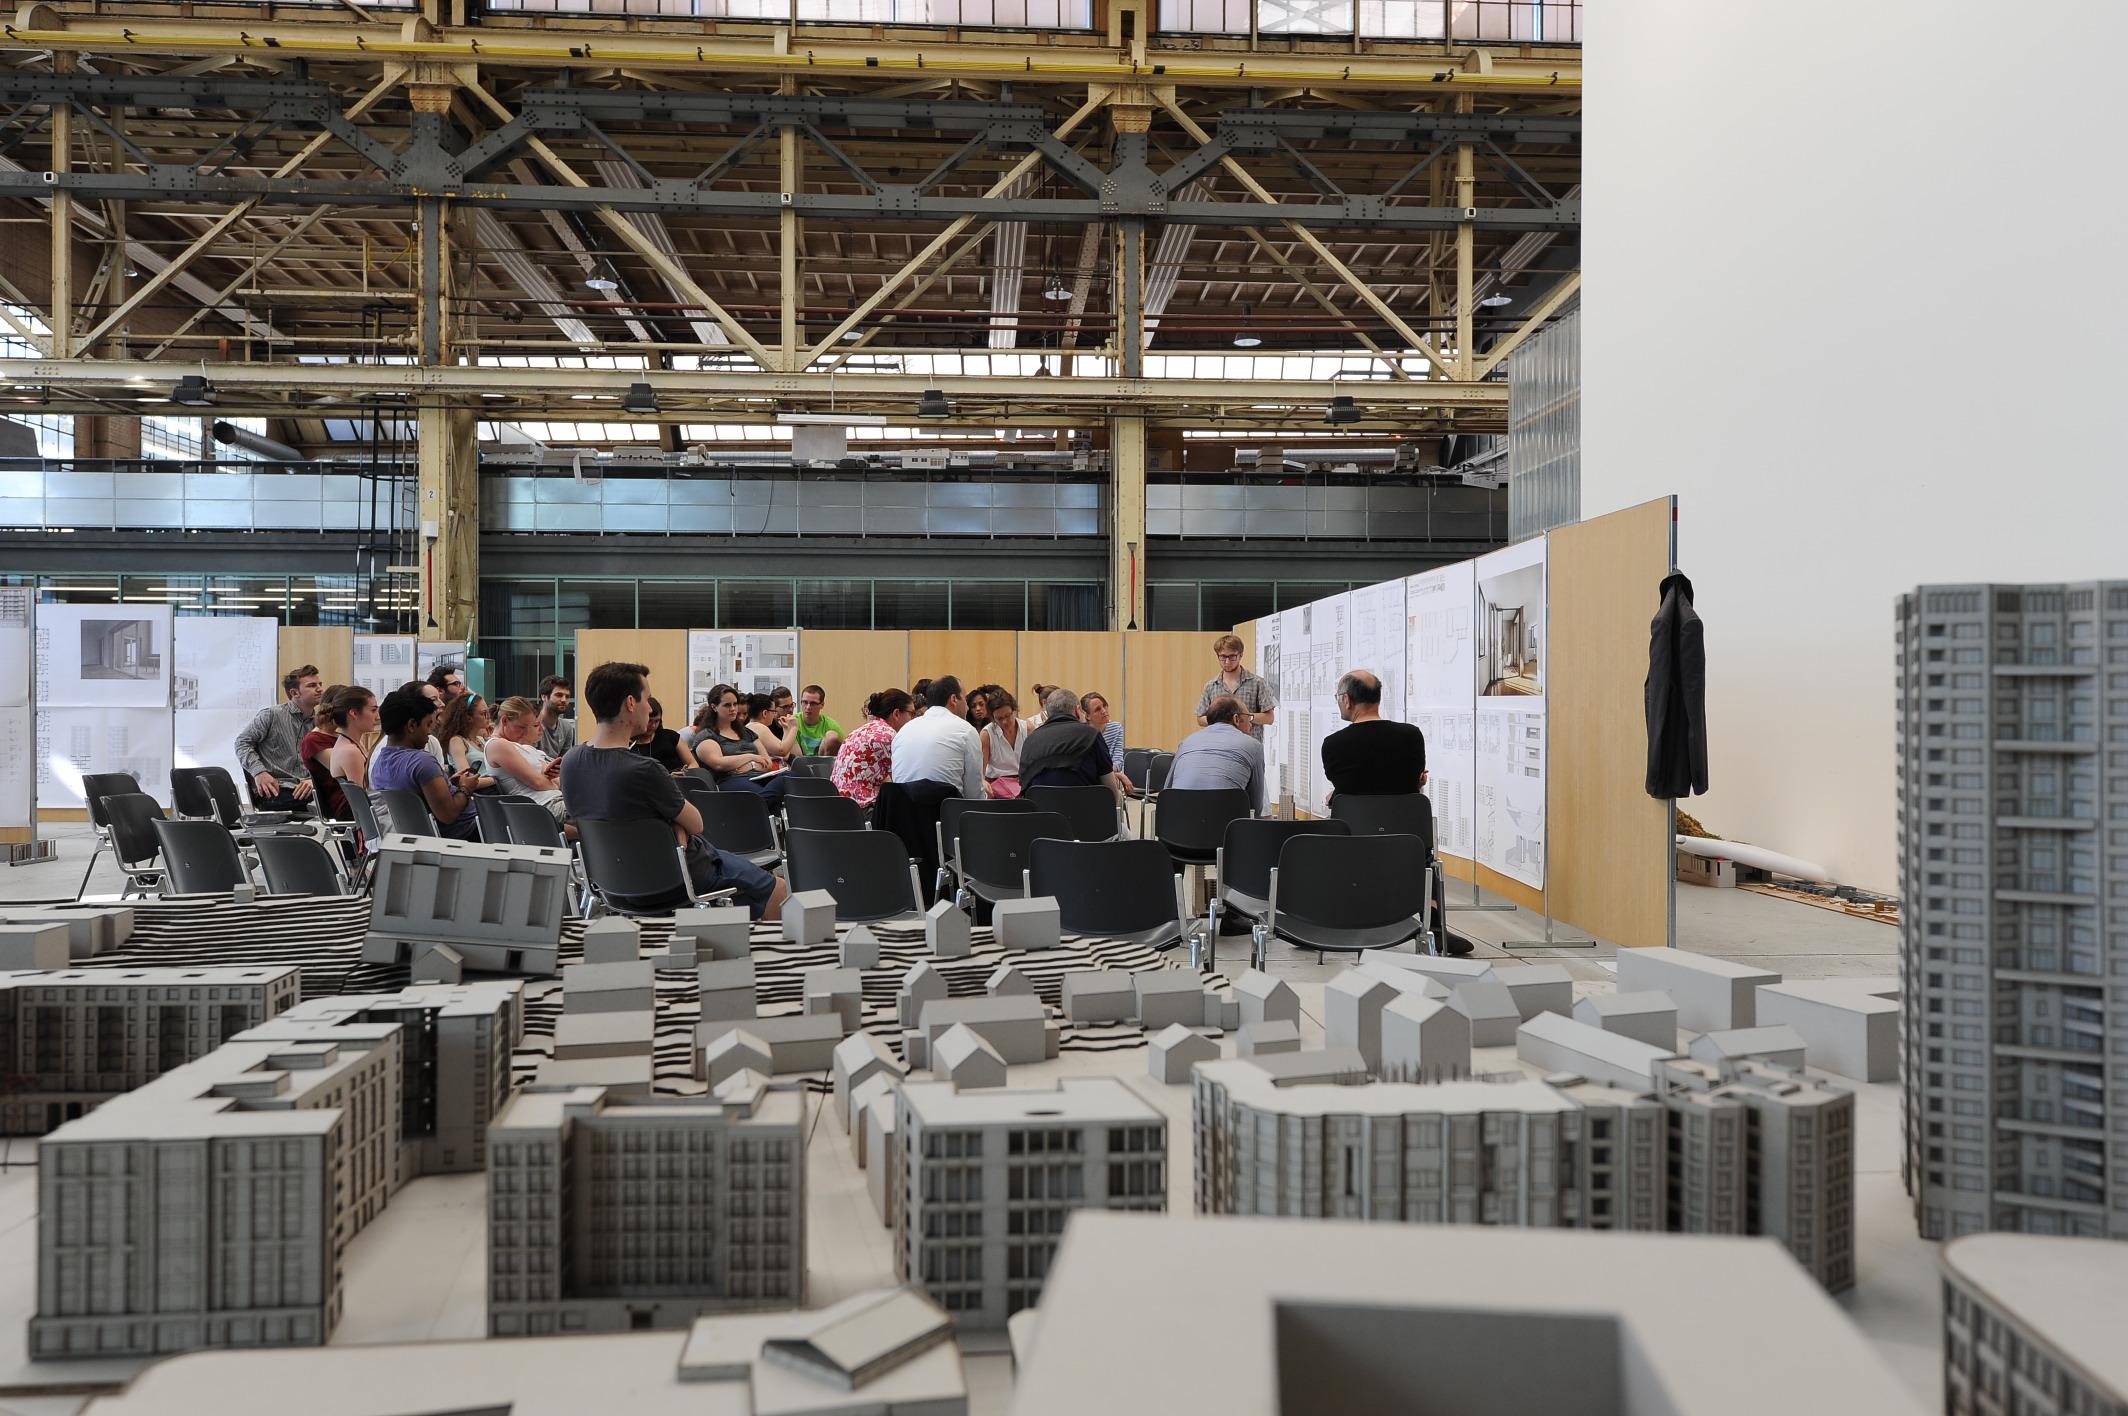 Bachelorstudiengang architektur zhaw architektur - Fh frankfurt architektur ...